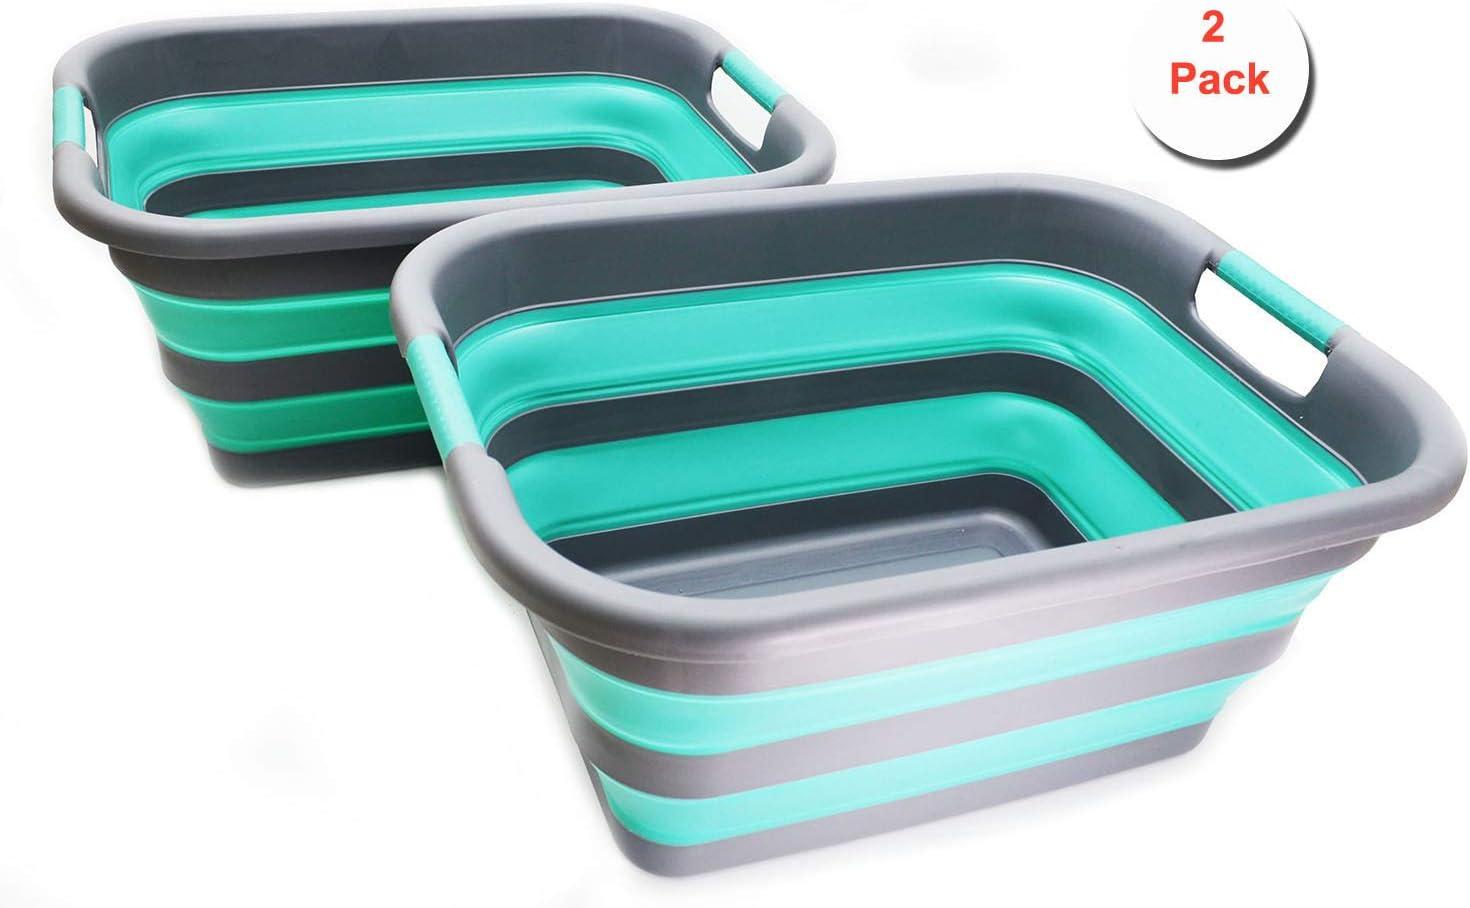 SAMMART Set of 2 Collapsible Plastic Laundry Basket - Foldable Pop Up Storage Container/Organizer - Portable Washing Tub - Space Saving Hamper/Basket (2, Grey/Turquoise Blue)